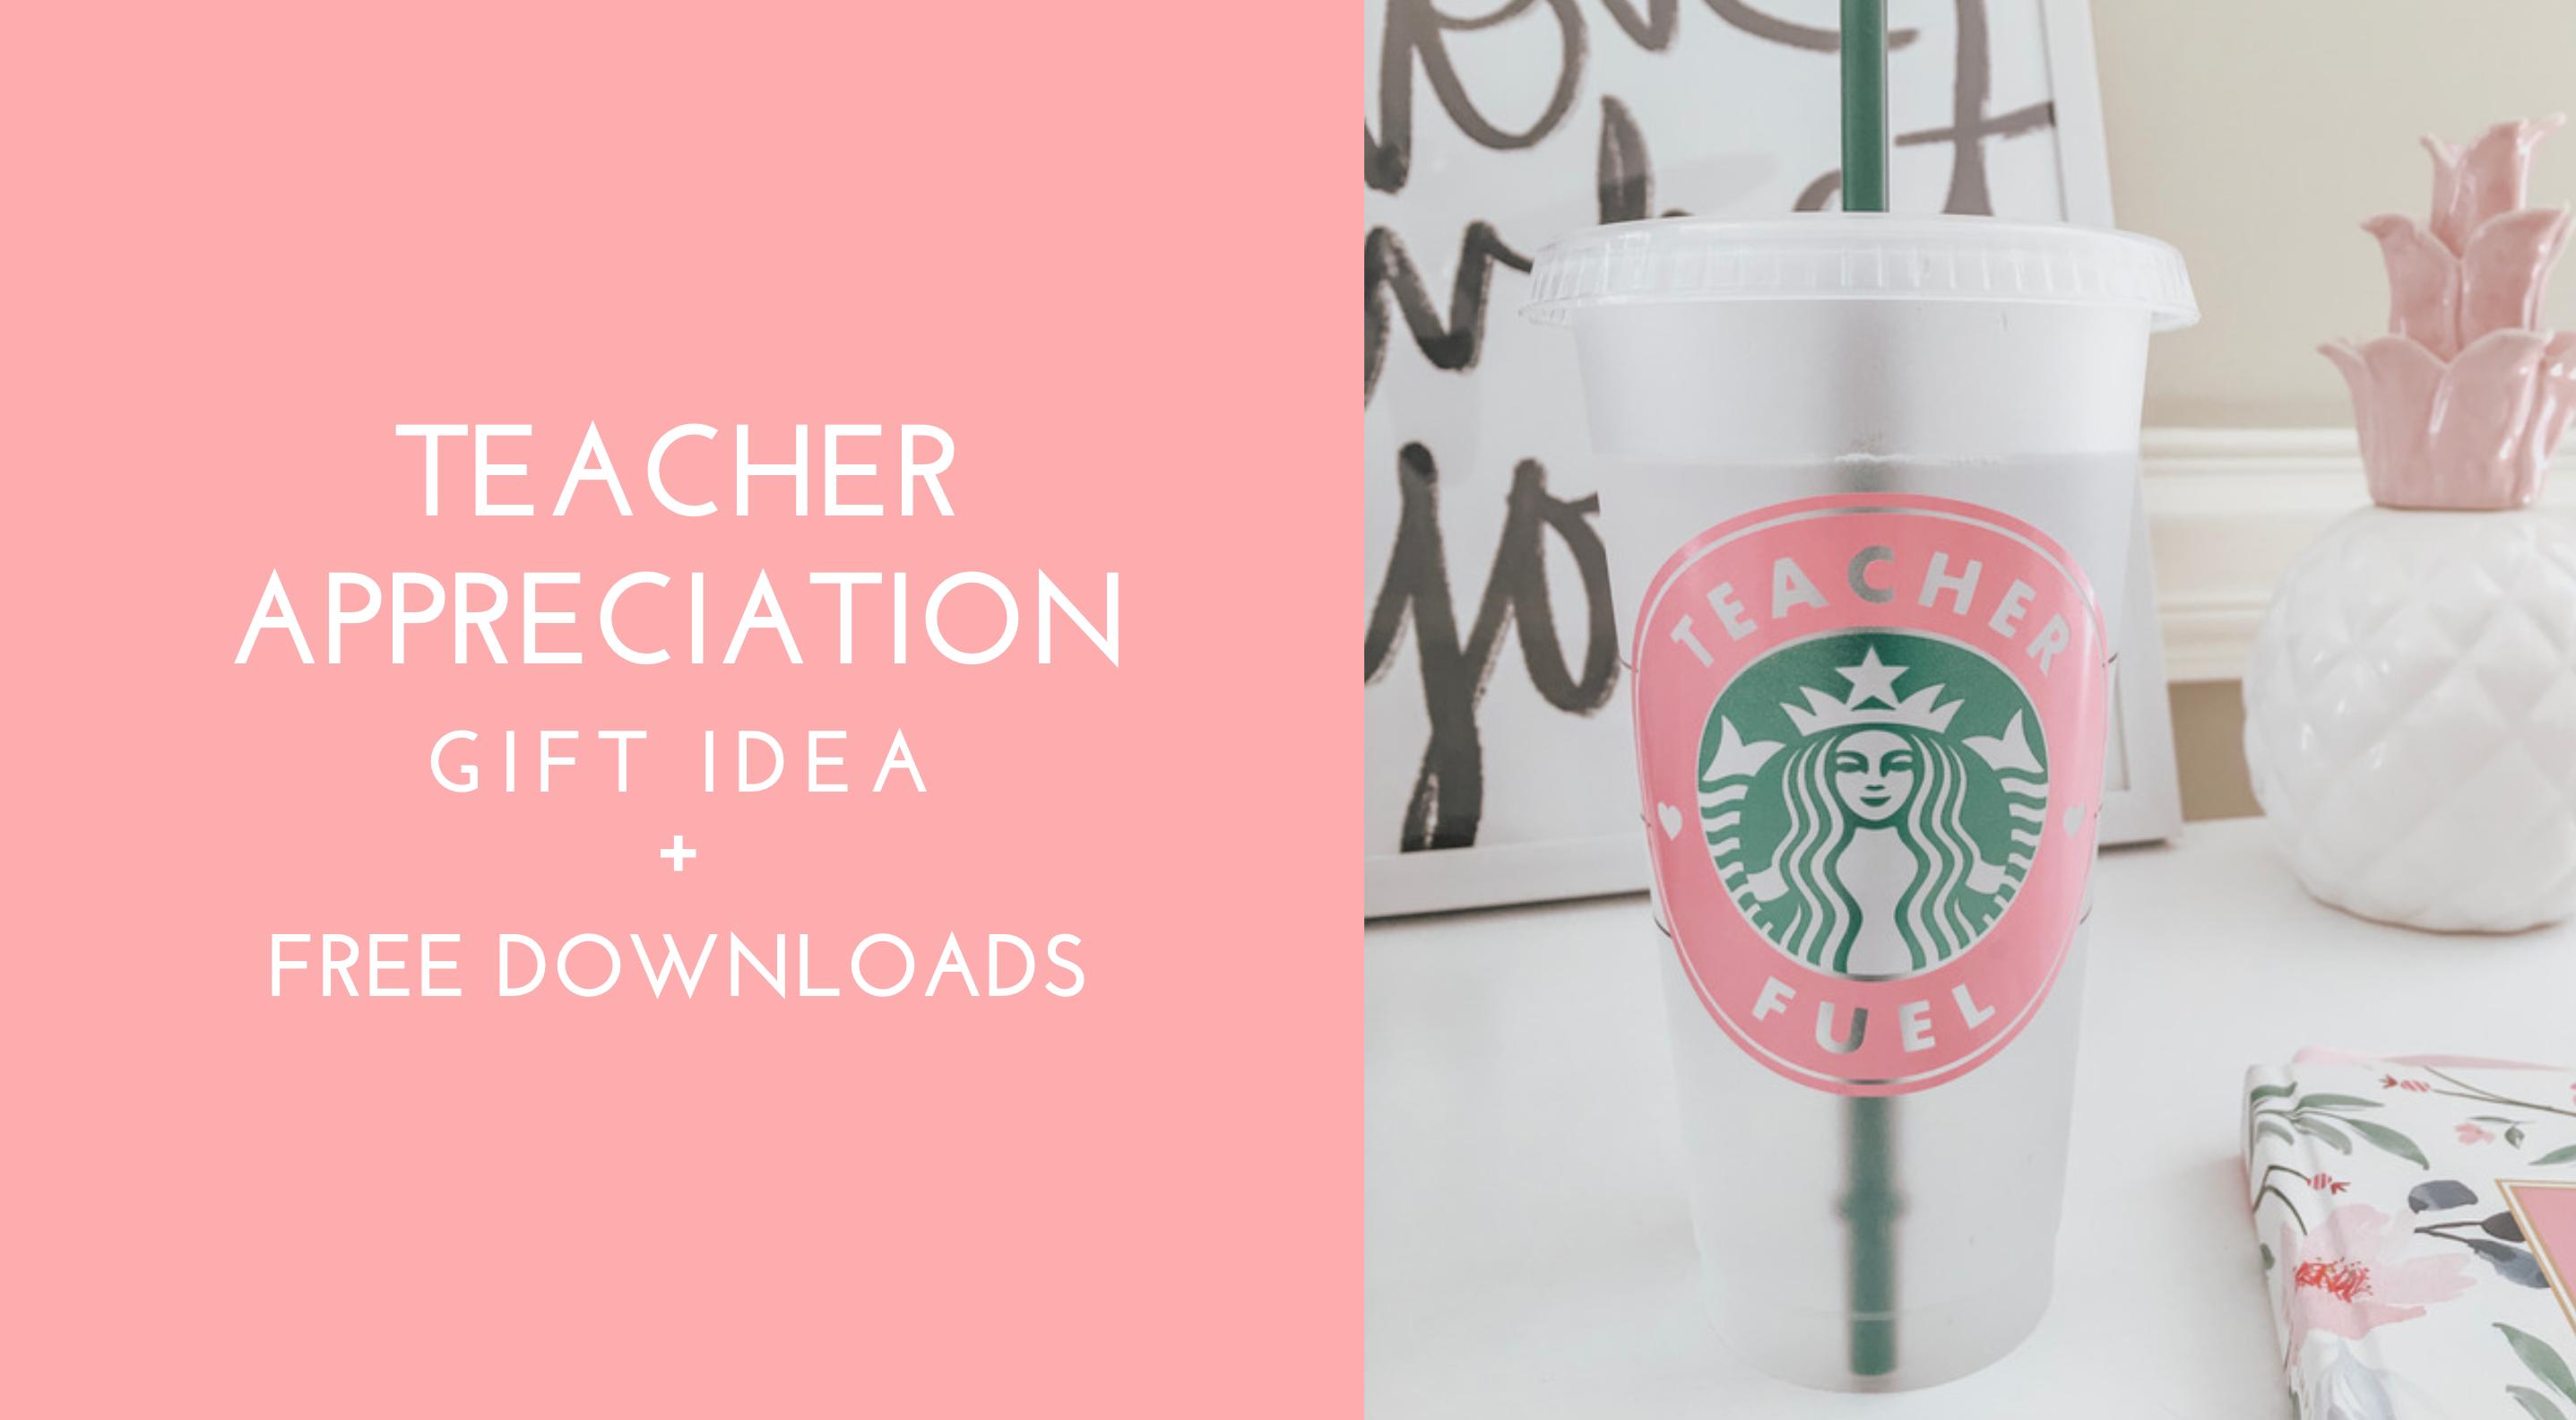 Teacher Appreciation Week Free Downloads Kayla Makes